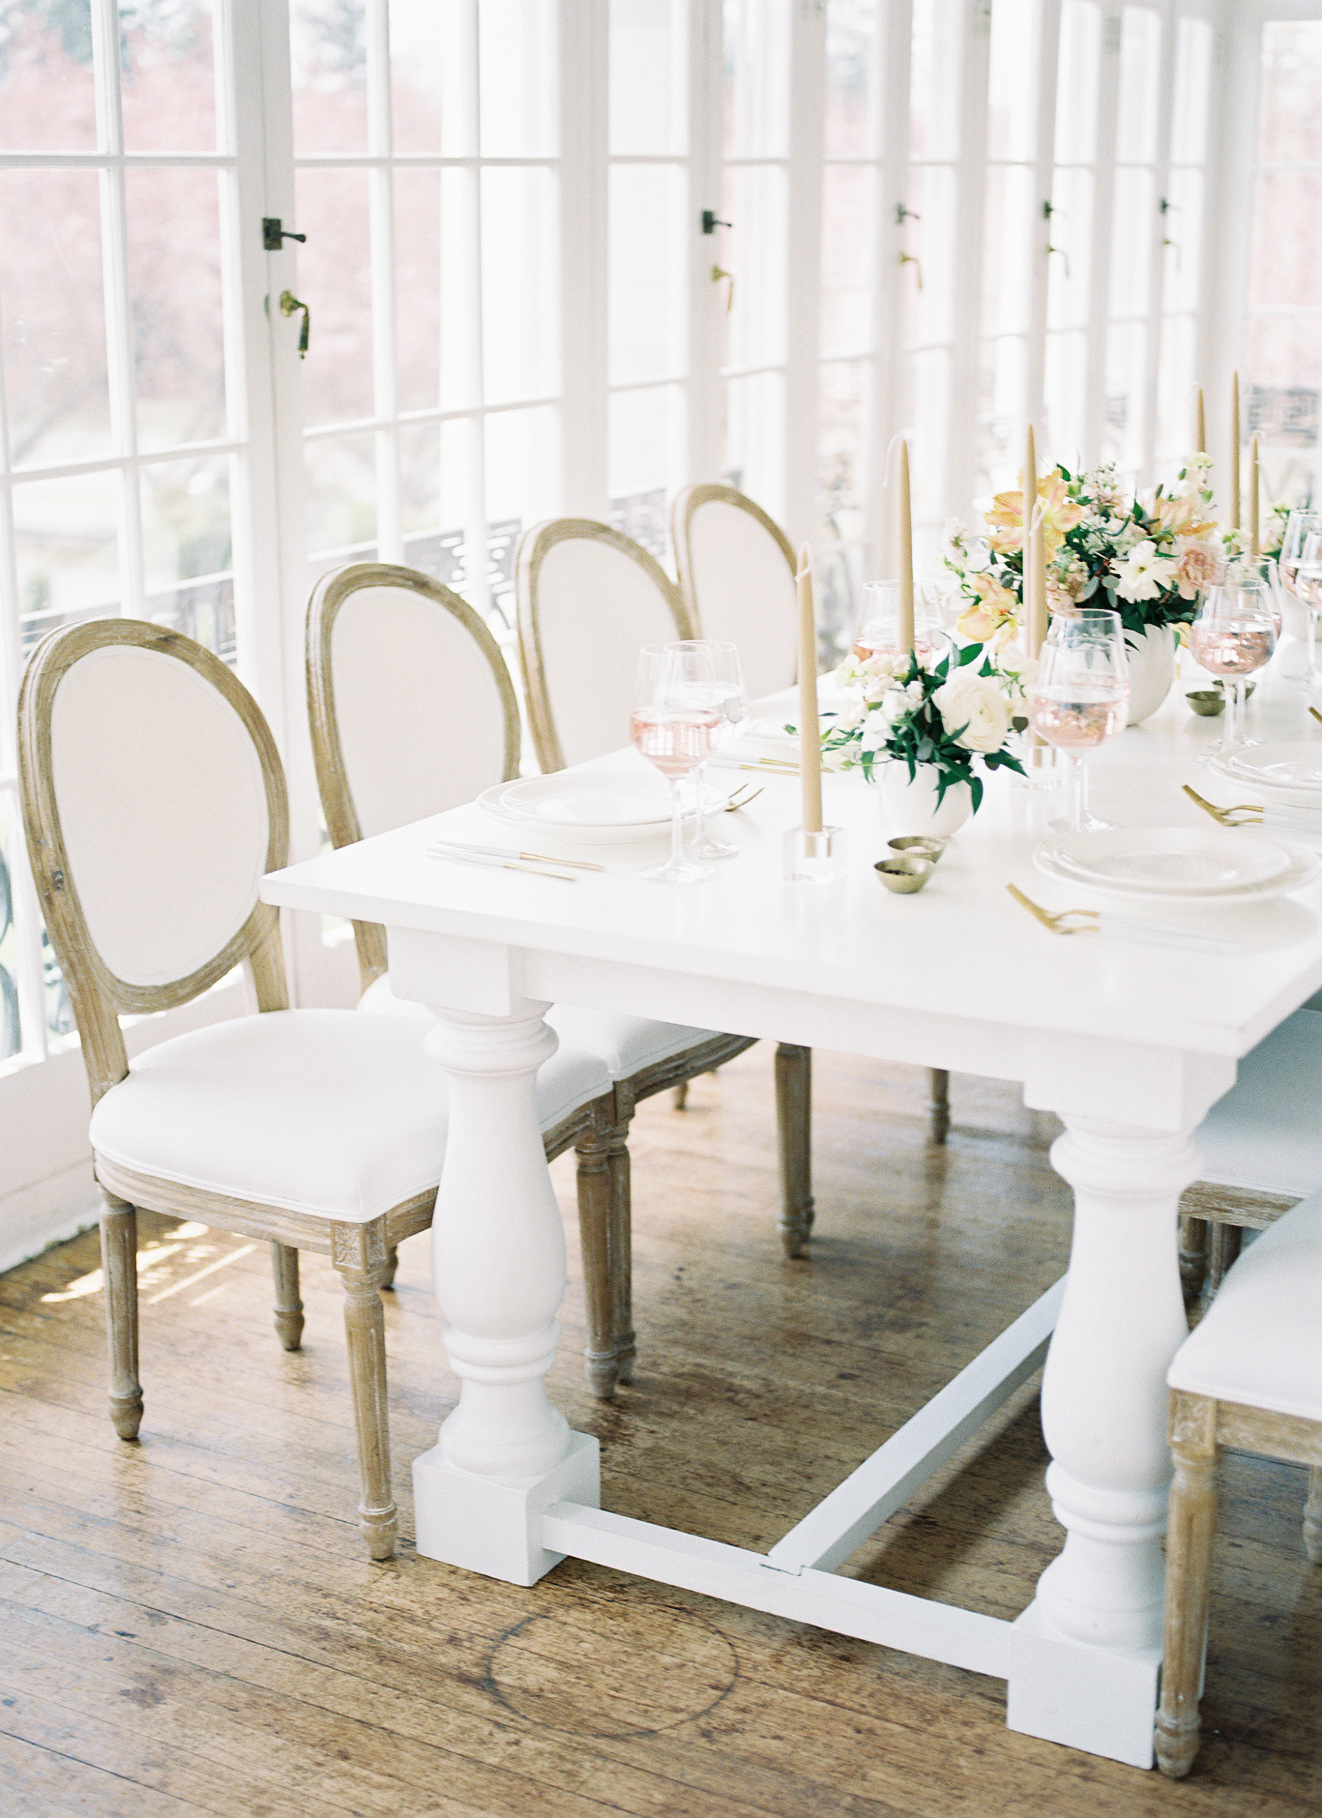 Philadelphia Wedding Photographer | LisamarieArtistry.com